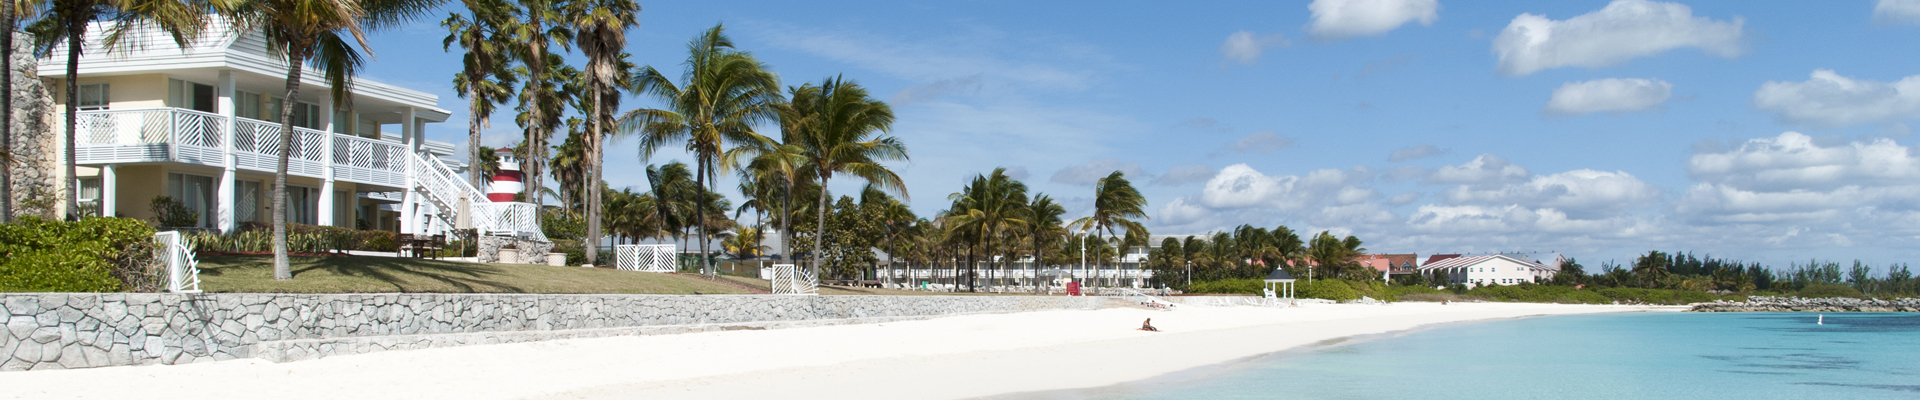 Lucaya Beach in Freeport, Bahamas